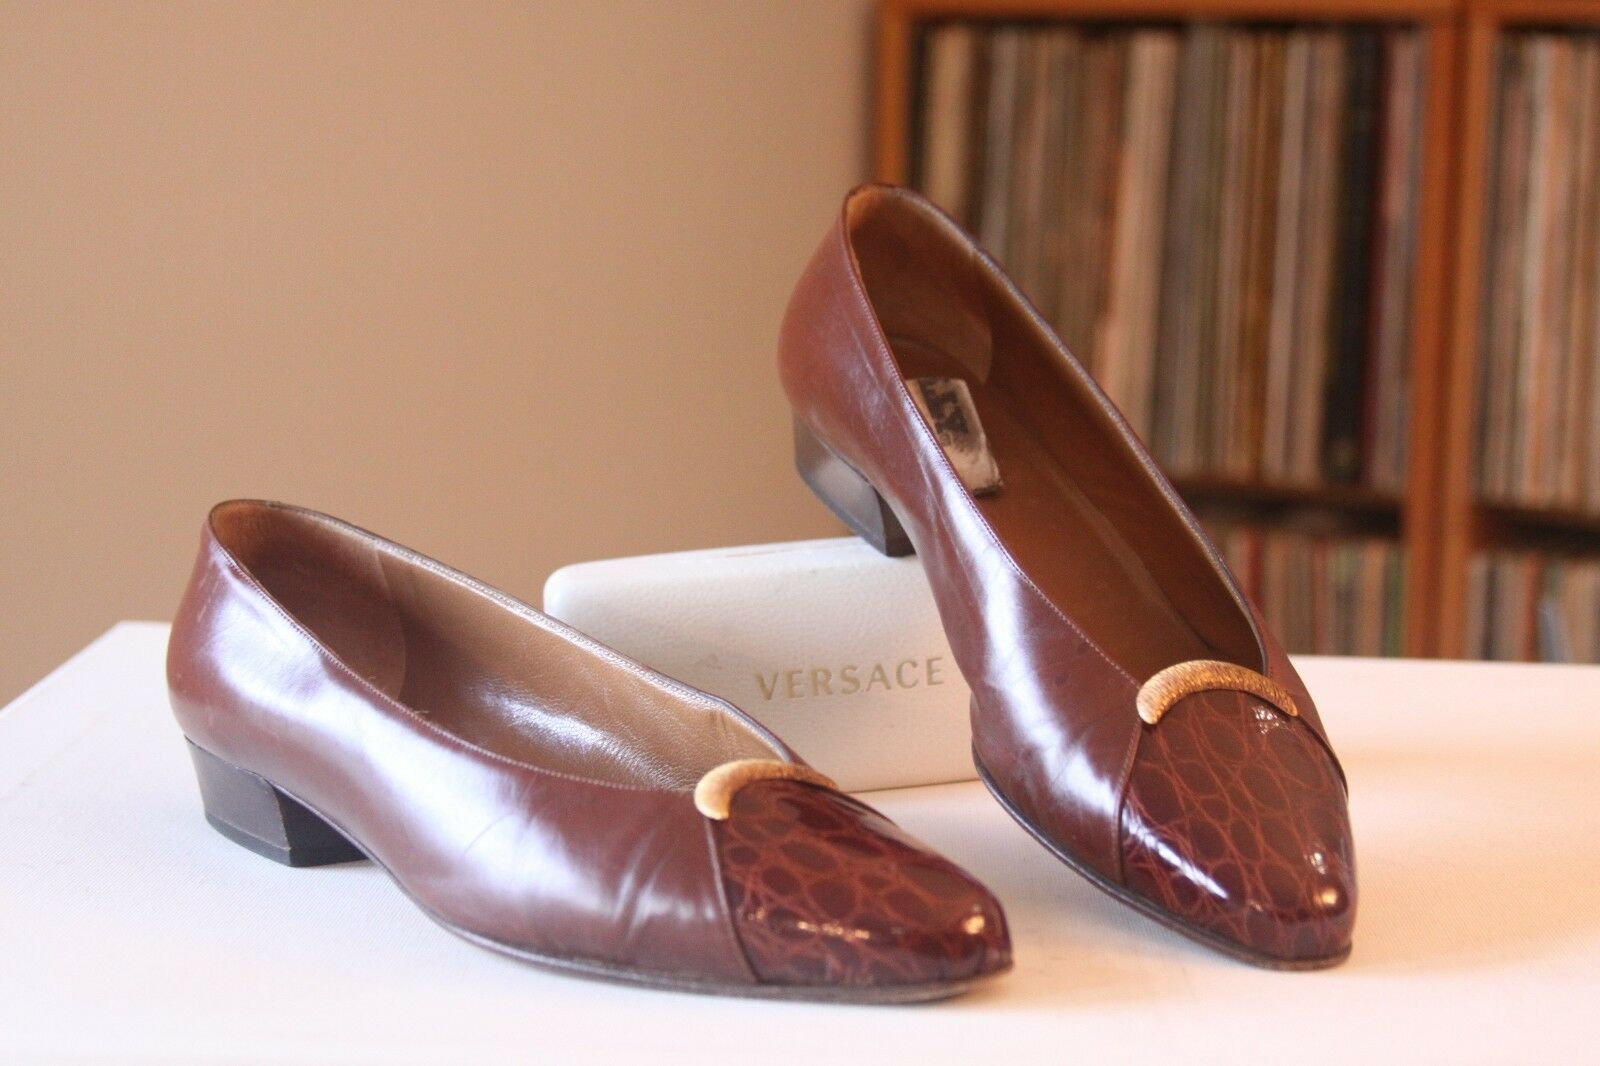 BALLY en cuir marron croco Cap Toe or Accent Escarpins Taille 8.5 M MADE IN ITALY